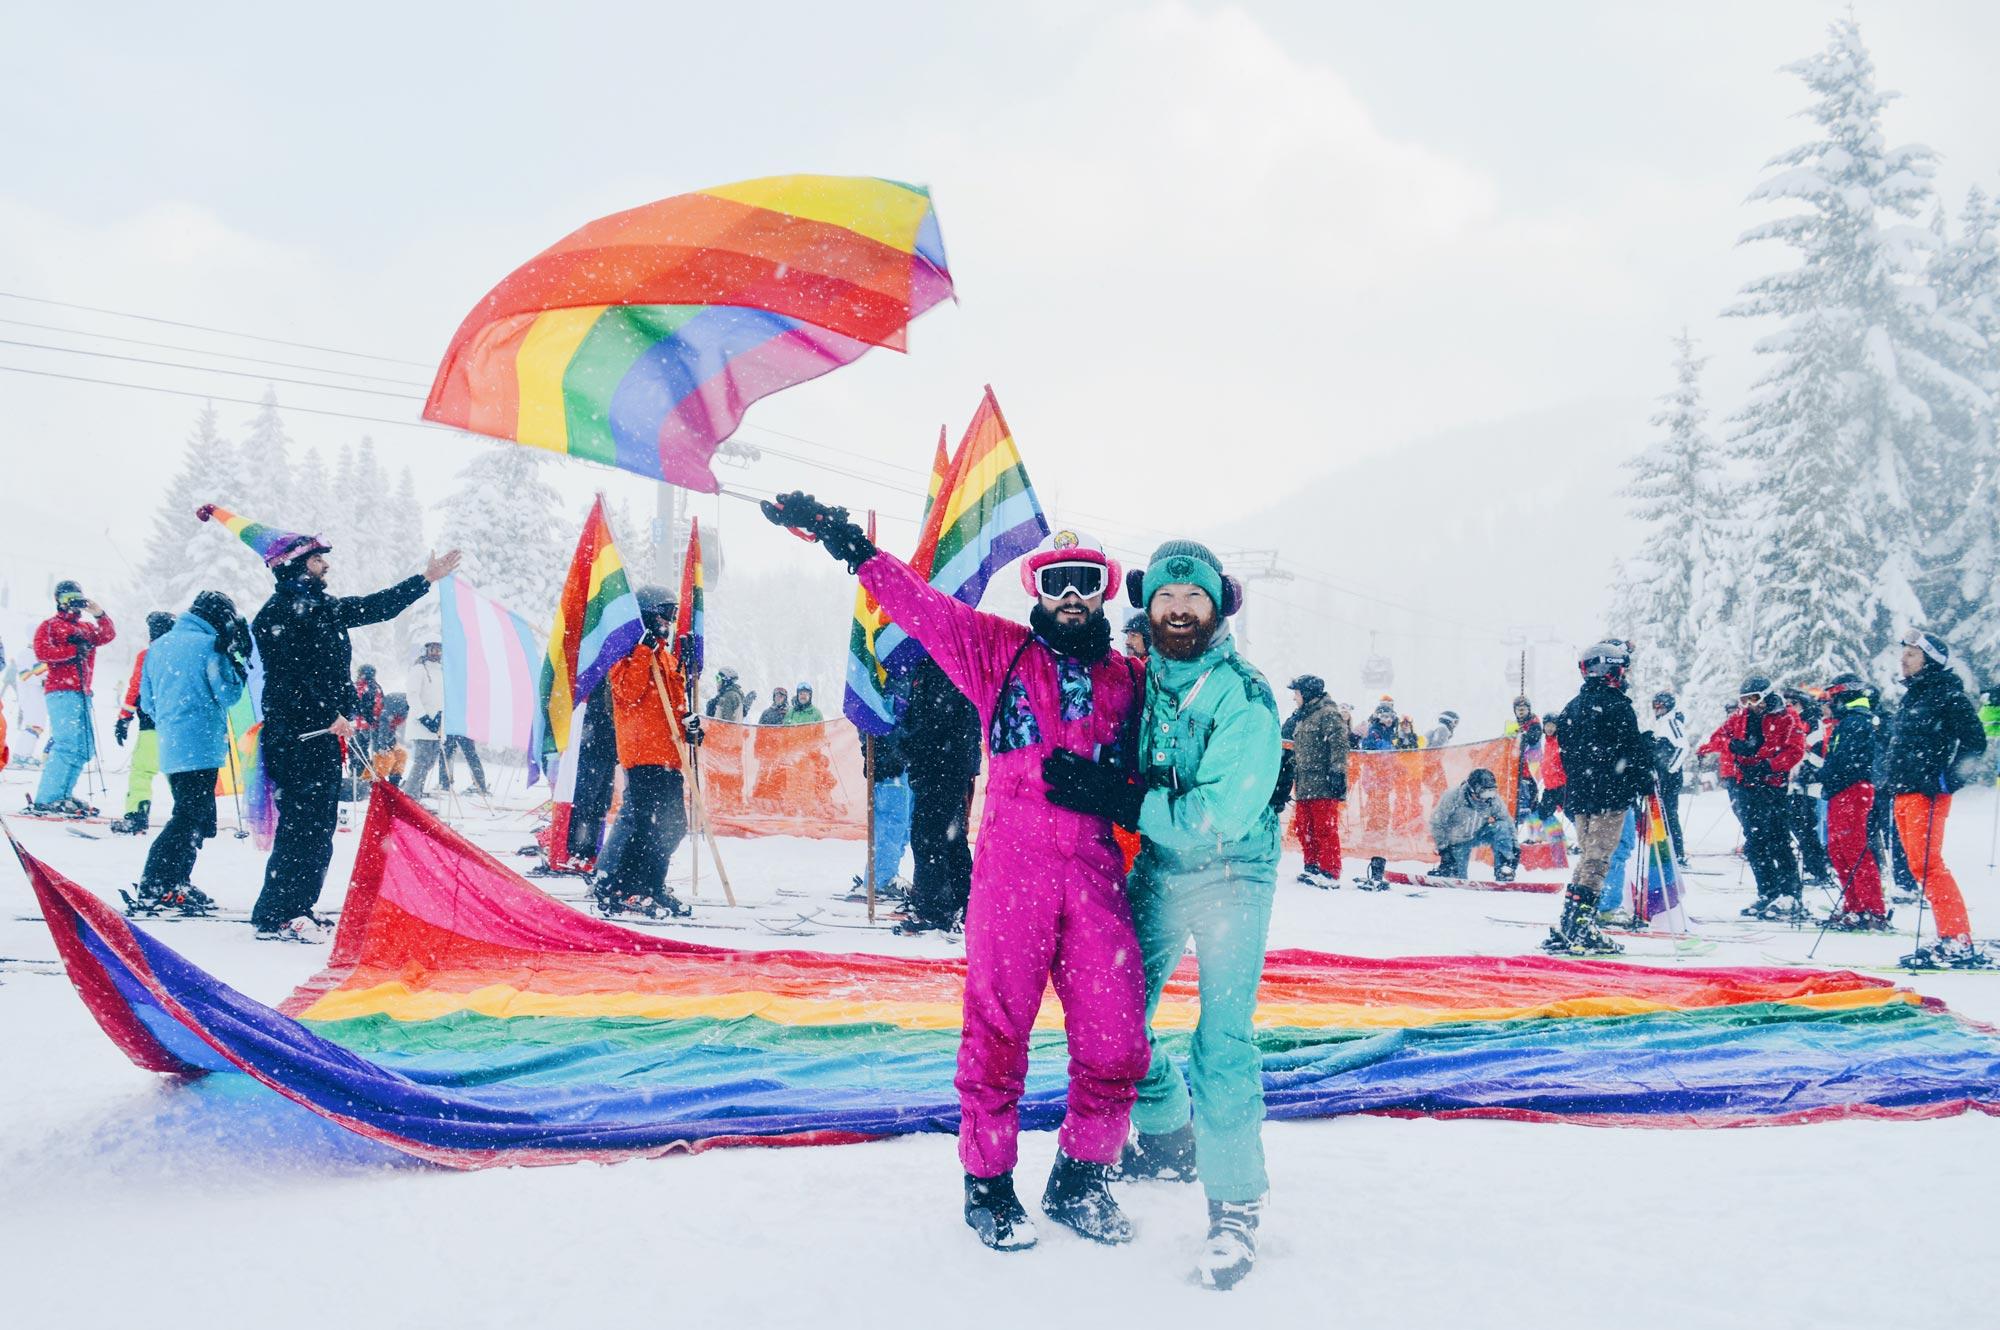 Whistler Pride & Ski Festival   Whistler Pride 2018 Gay Ski Week © CoupleofMen.com